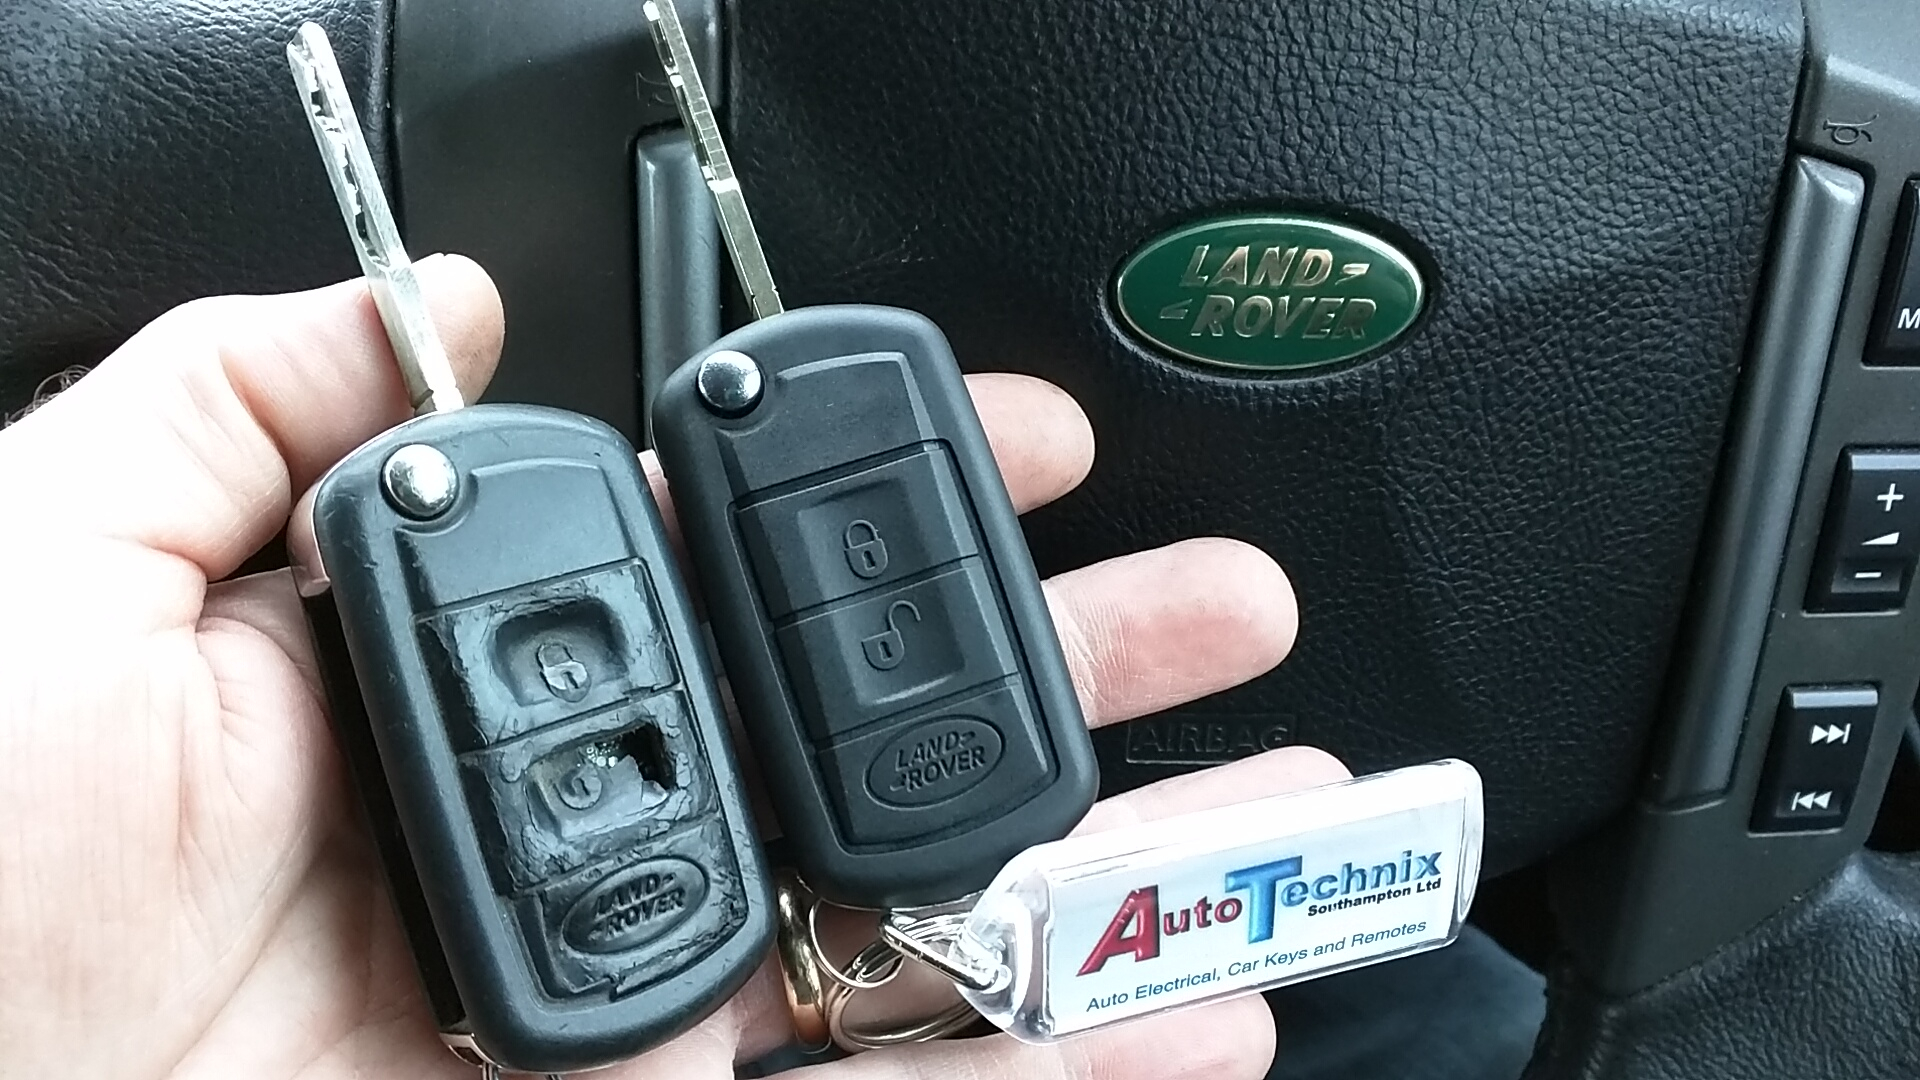 Car Key Replacement >> Replacement Car Van Keys Autotechnix Southampton Ltd